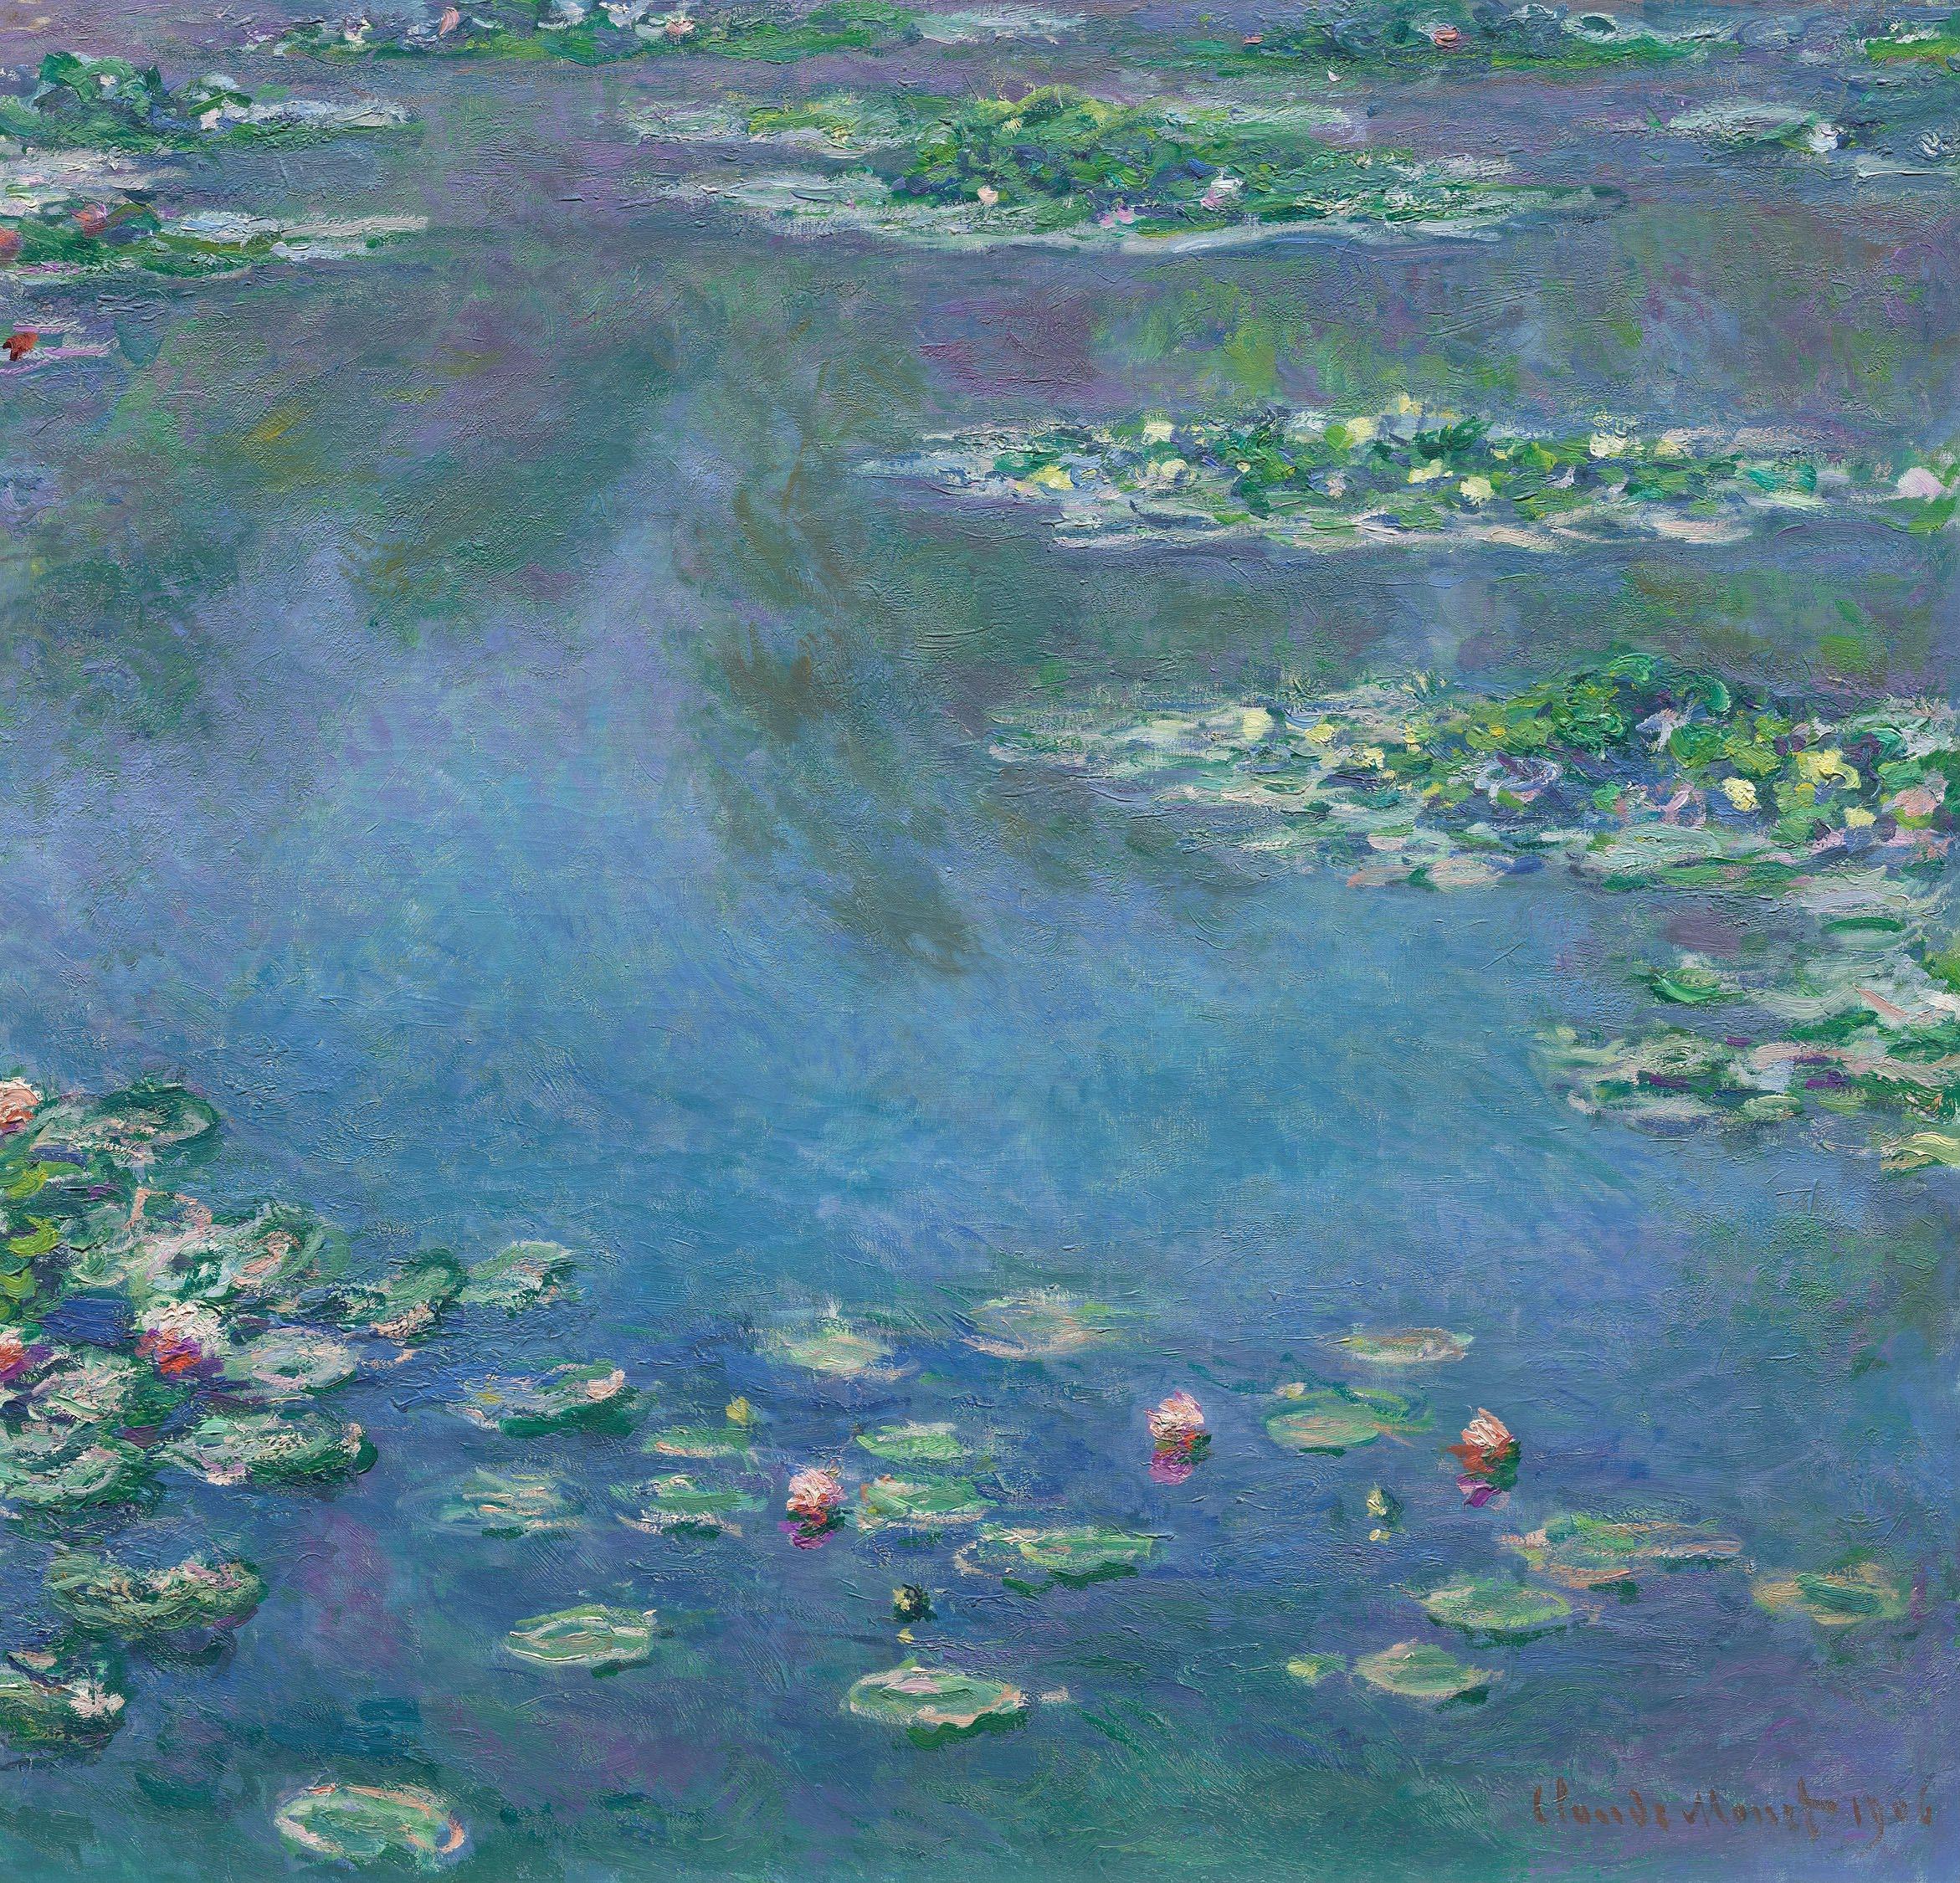 Claude Monet - Water Lilies - 1906, Ryerson.jpg